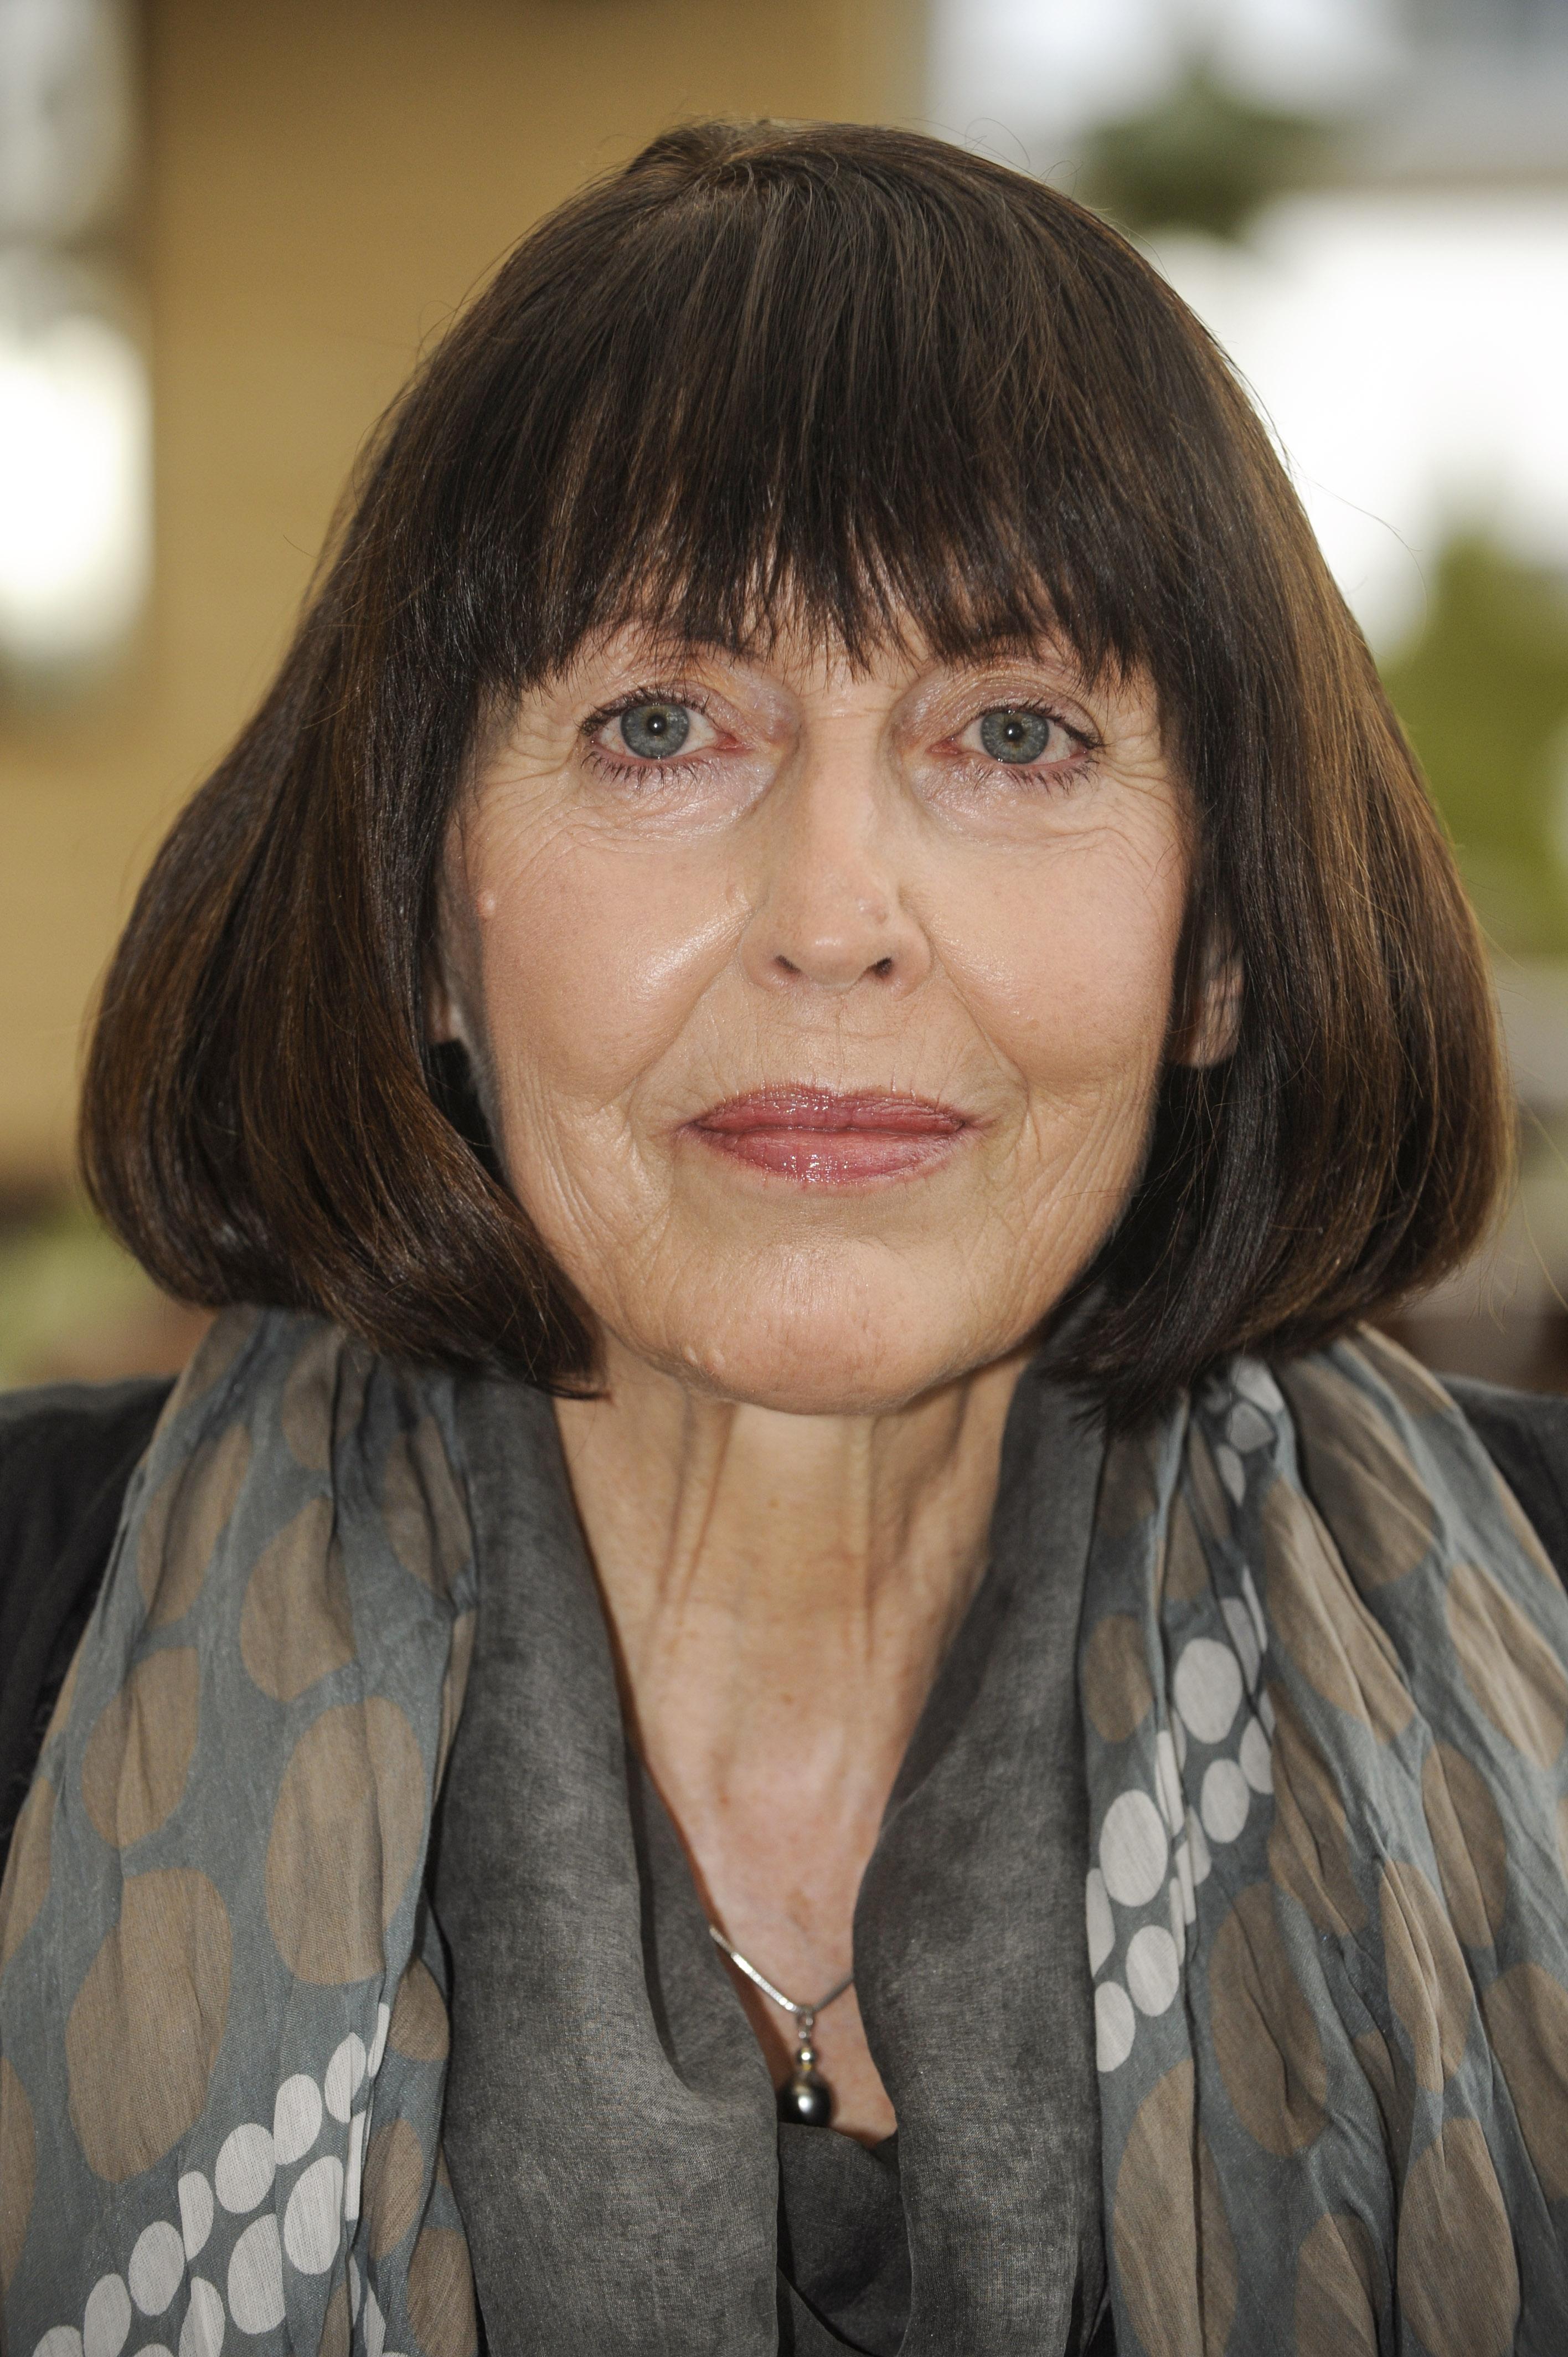 Rückt für Lutz Recknagel nach: Gisela Sparmberg